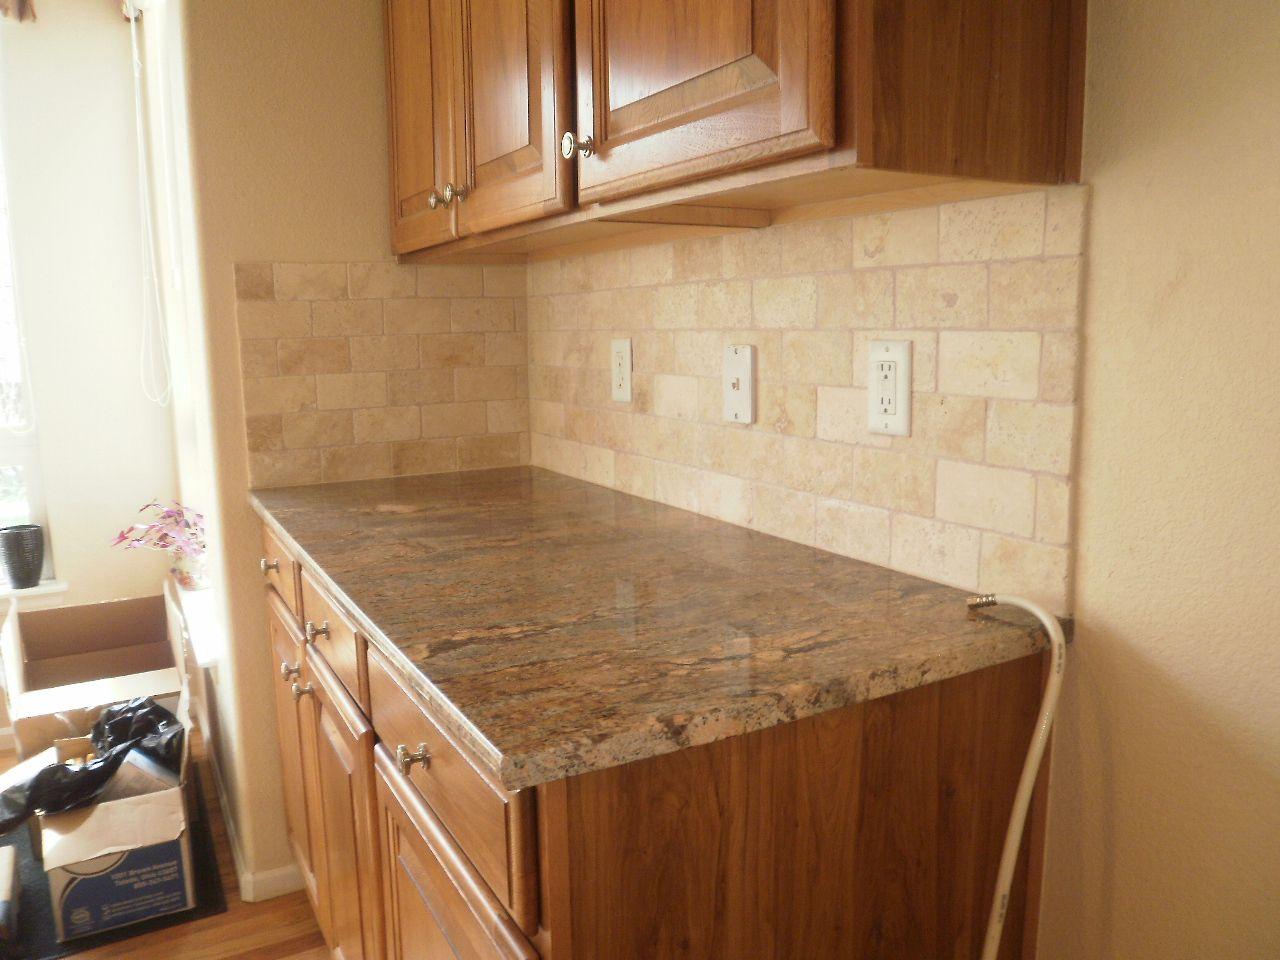 Travertine Tile Patterns For Kitchens